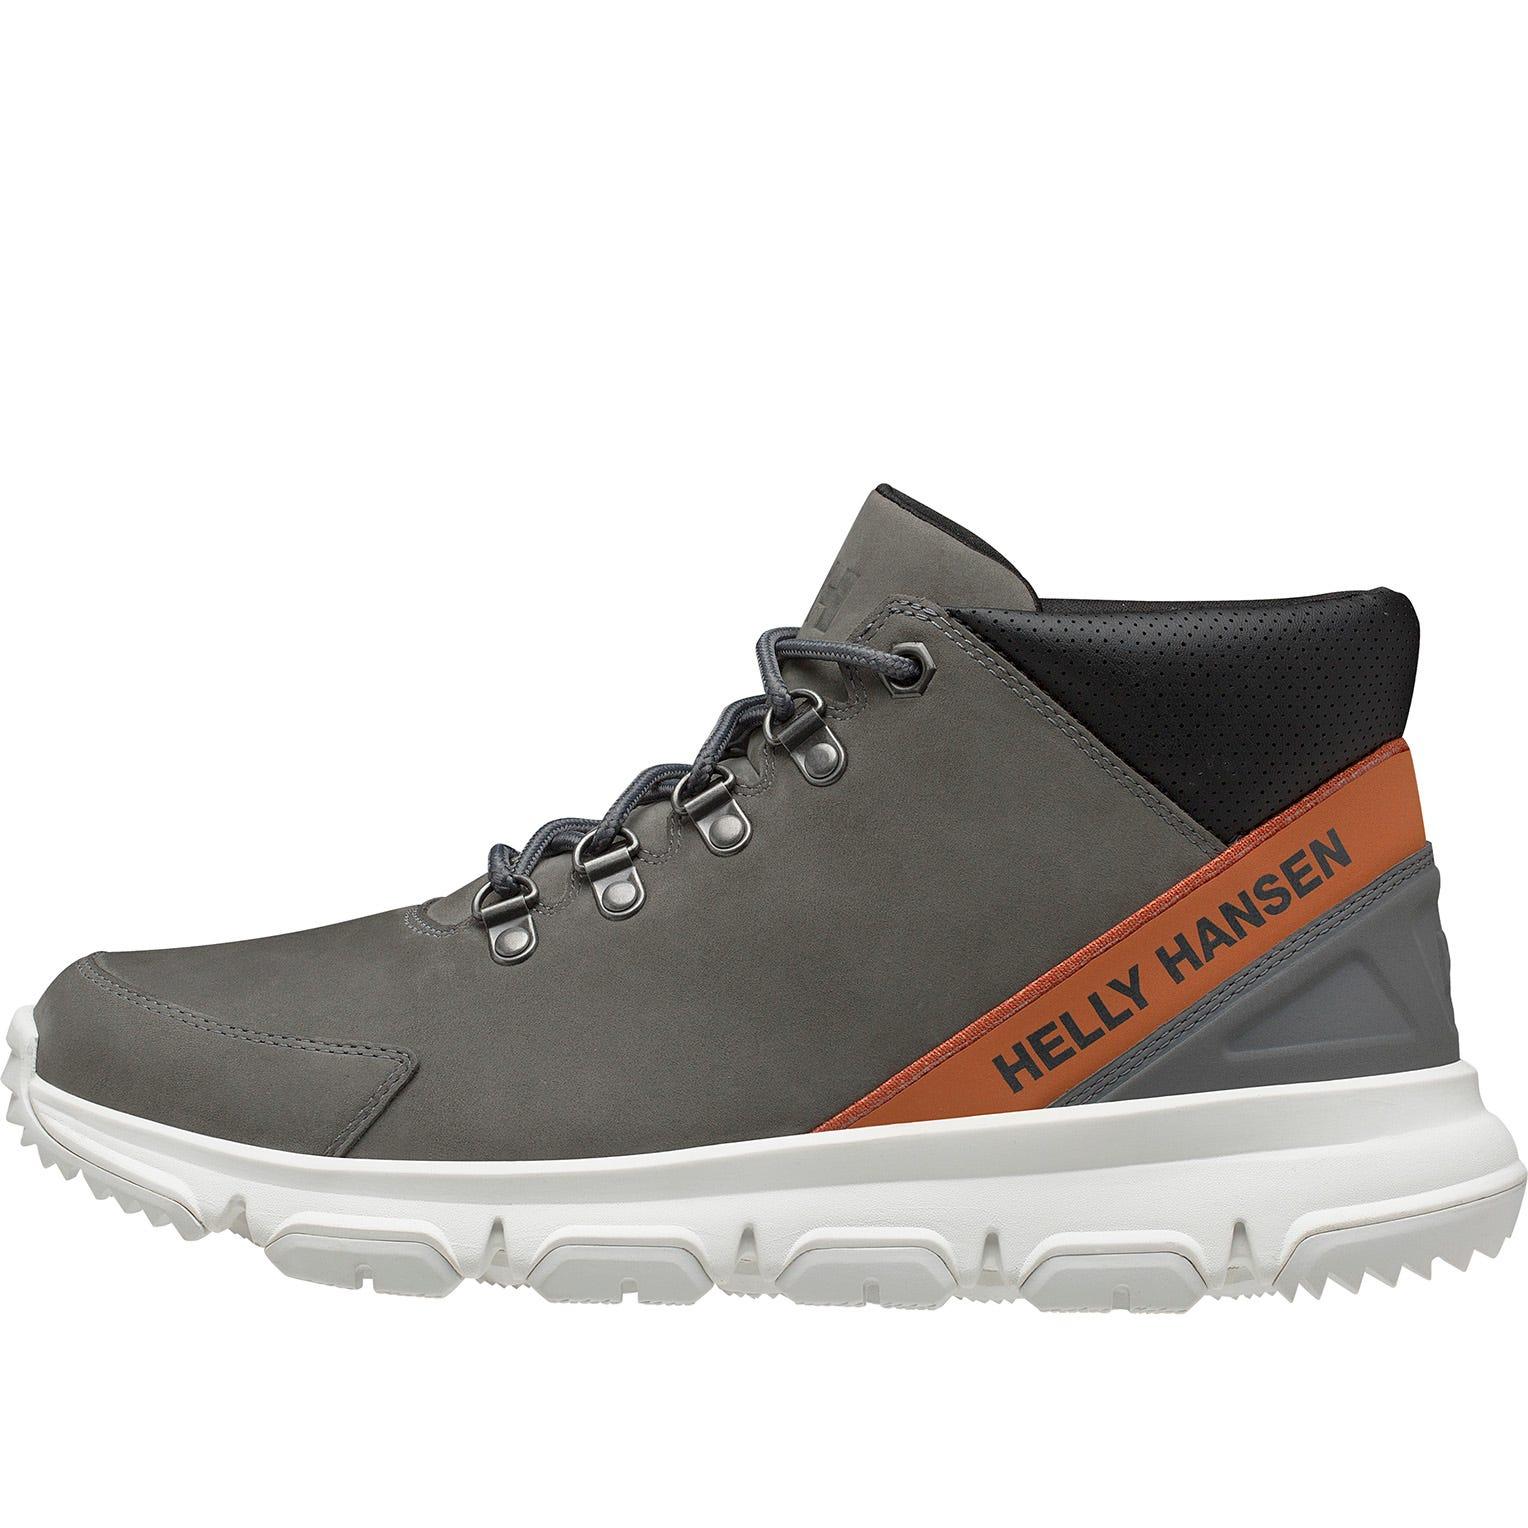 Helly Hansen Fendvard Boot Winter Grey 46/11.5